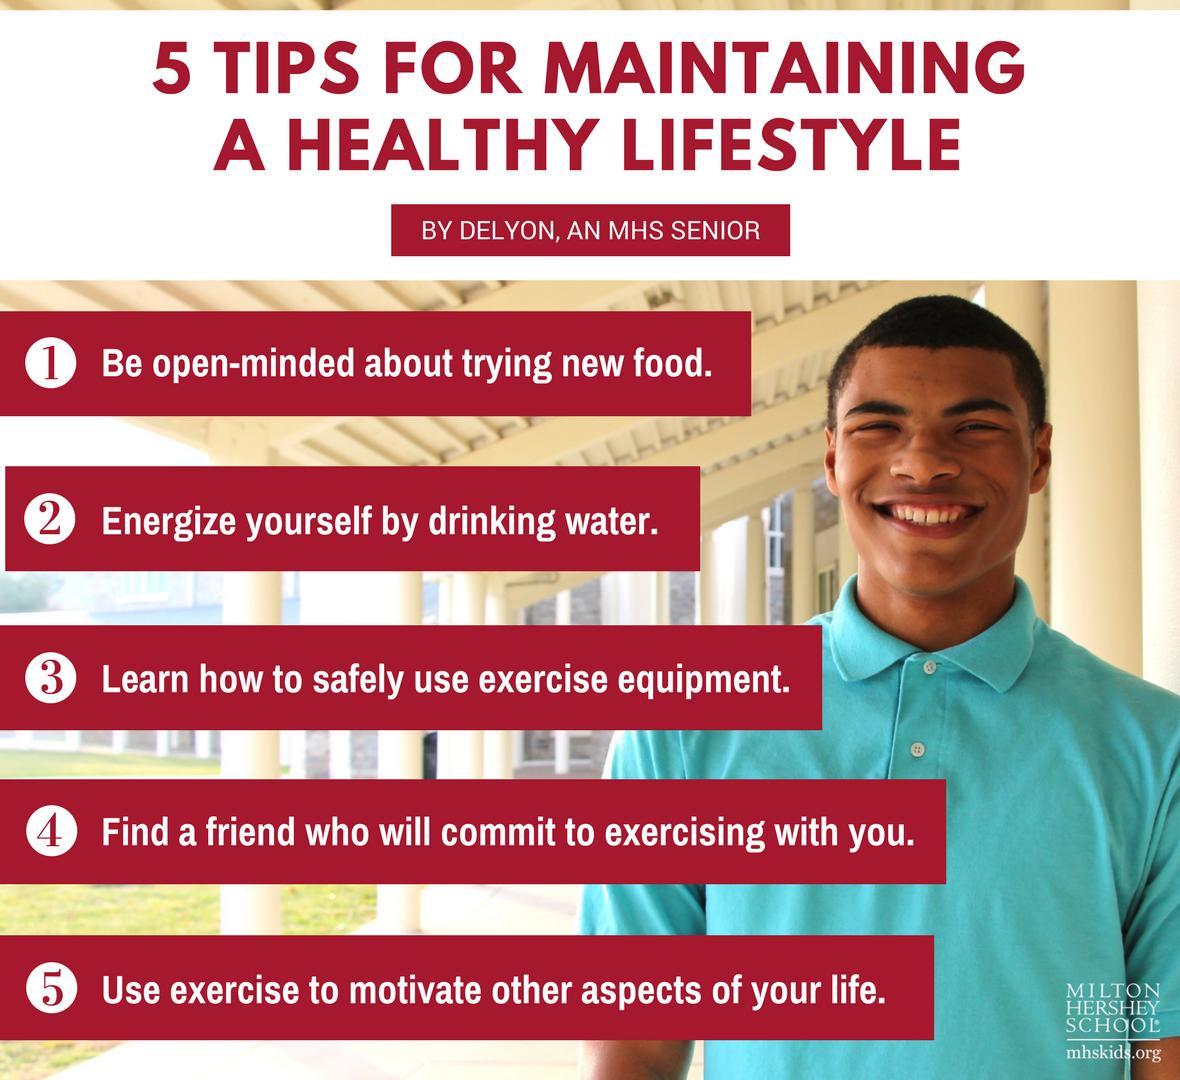 Delyon, an MHS senior, shared health and wellness tips